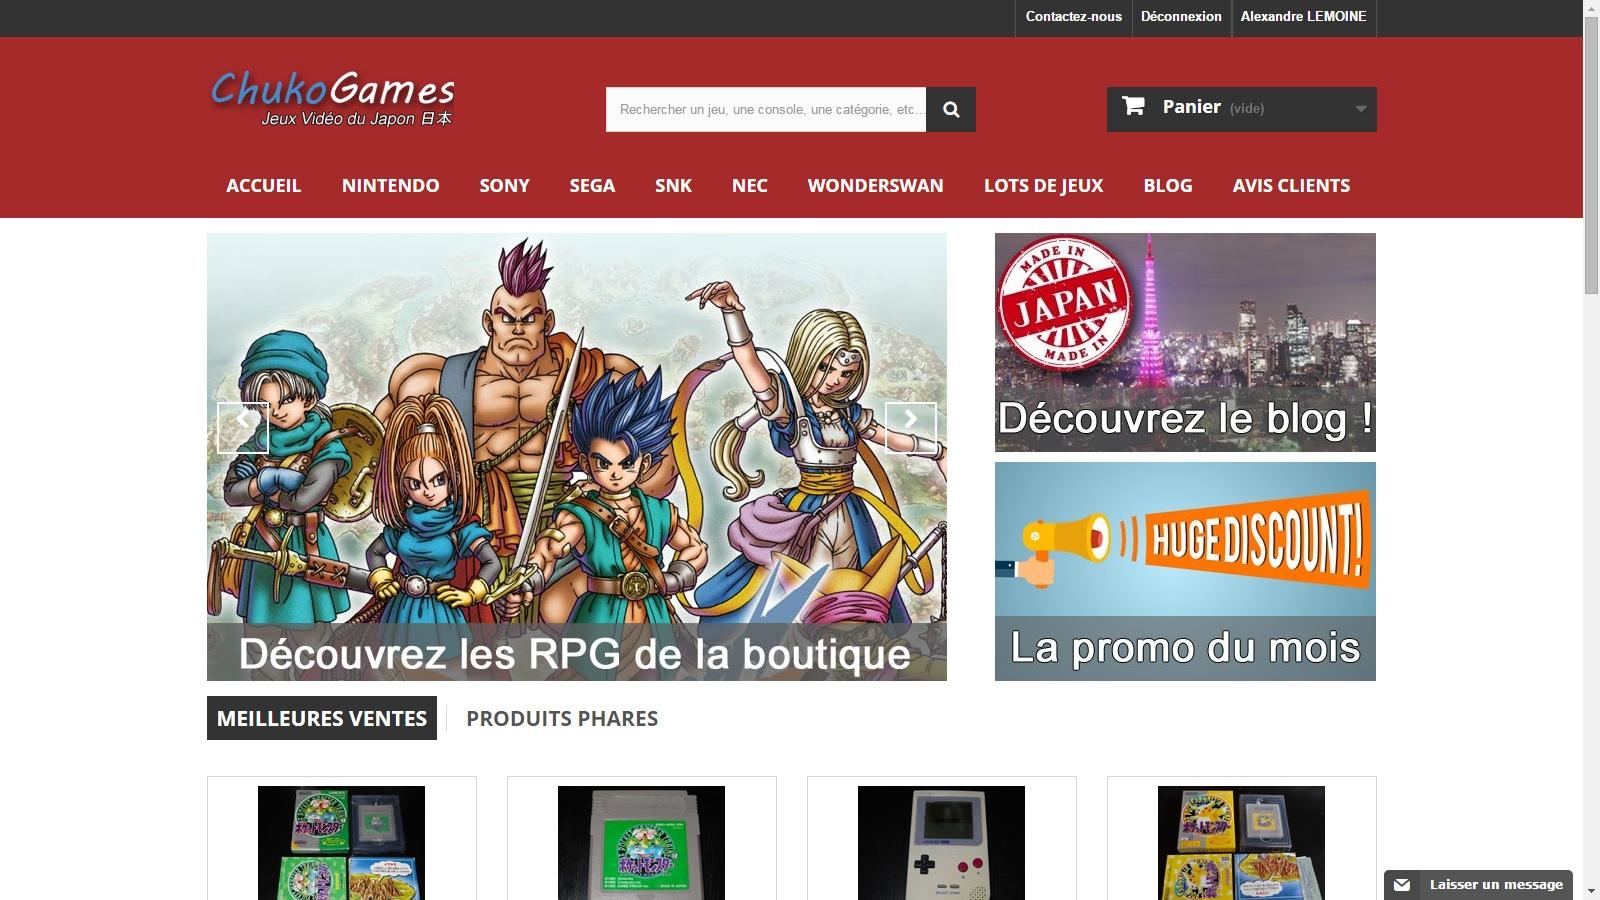 Premier web-design de Chukogames